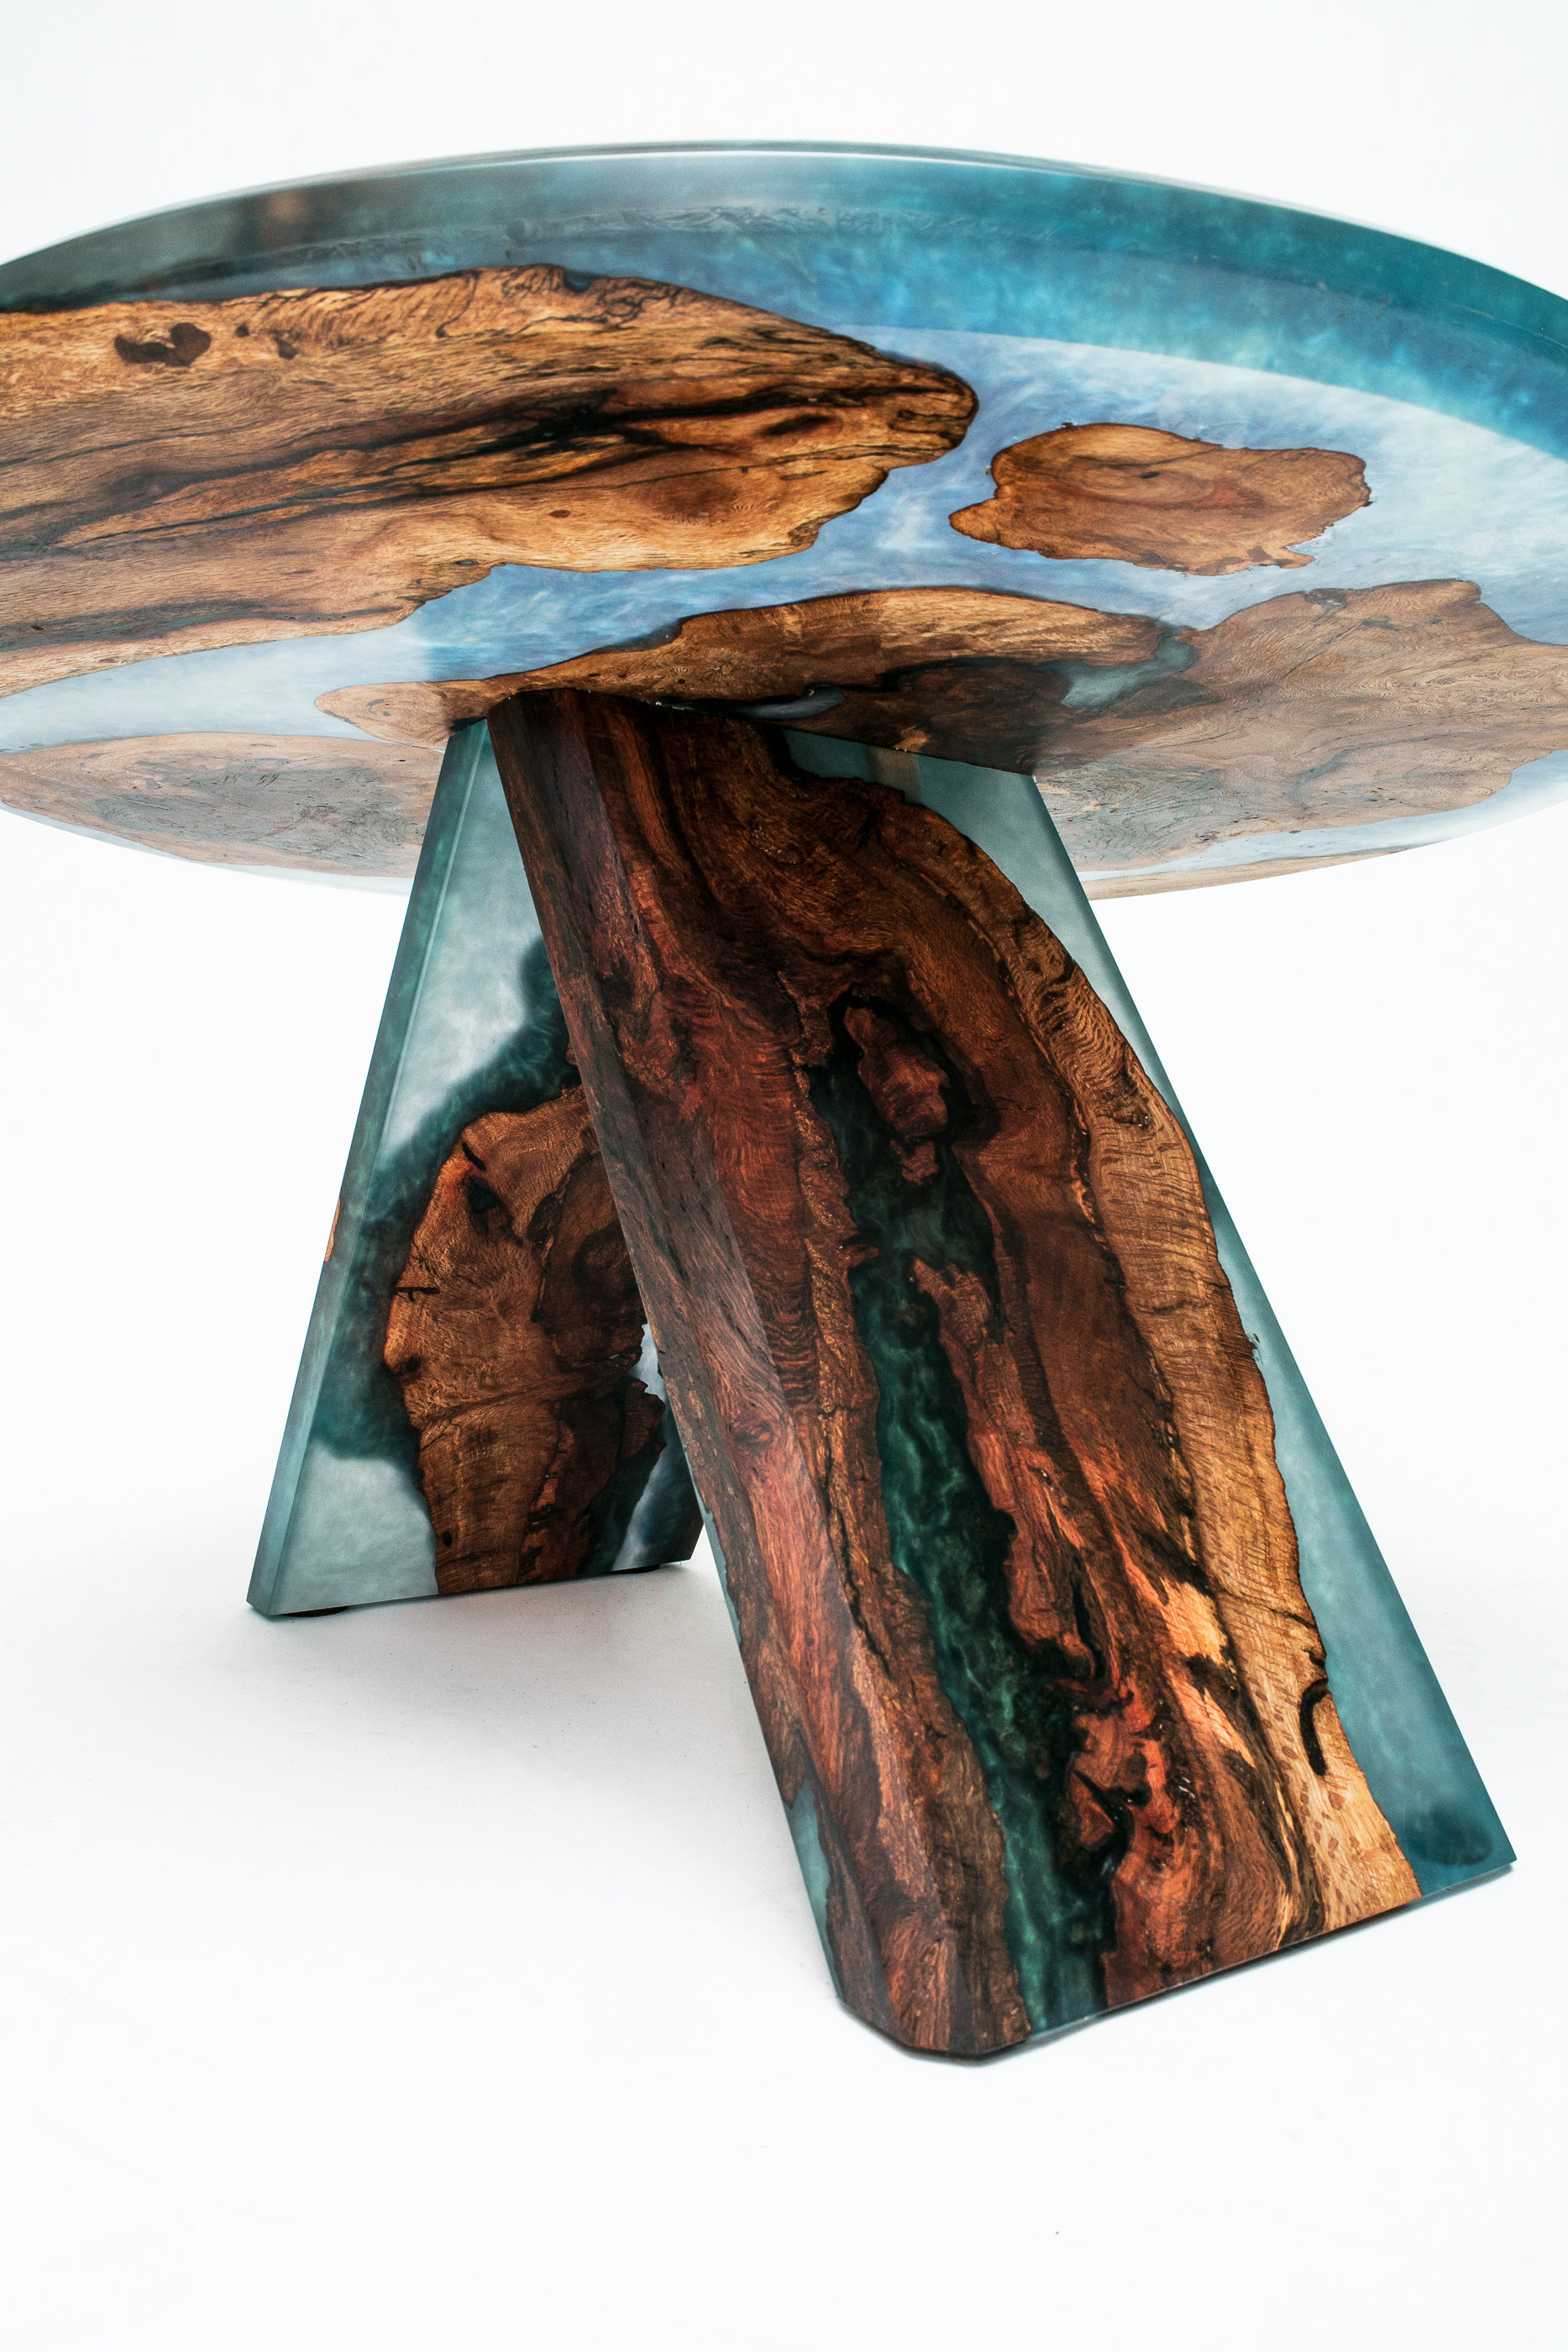 Black Cherry Burl Islands Blue Green Resin Art 30 Coffee Table Lumberlust Designs